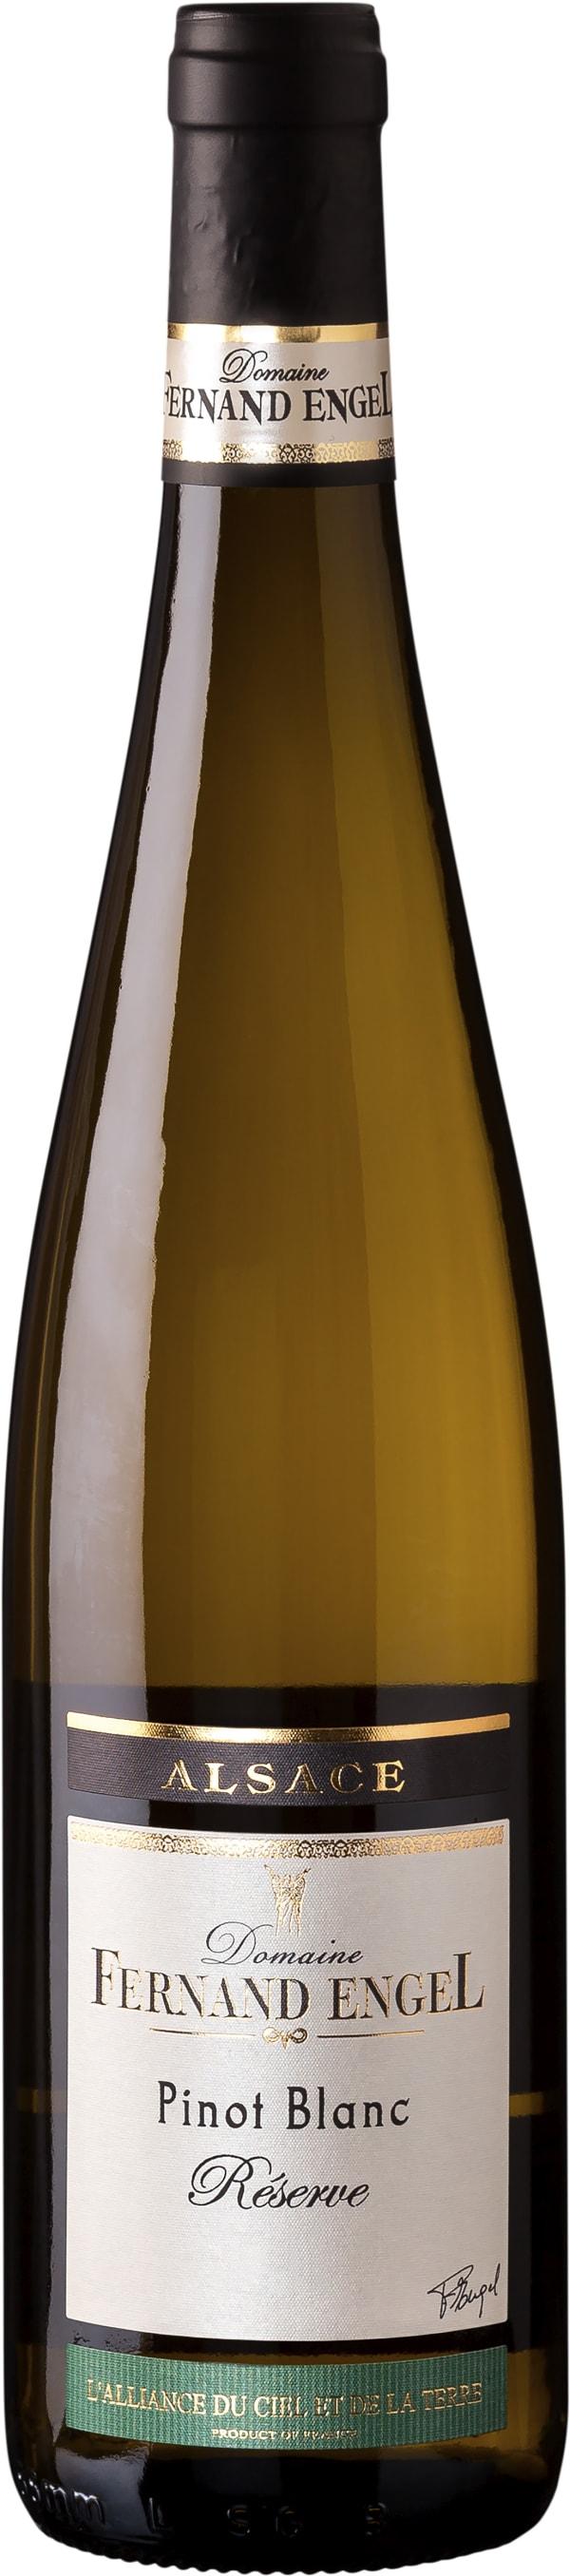 Fernand Engel Pinot Blanc Réserve 2019